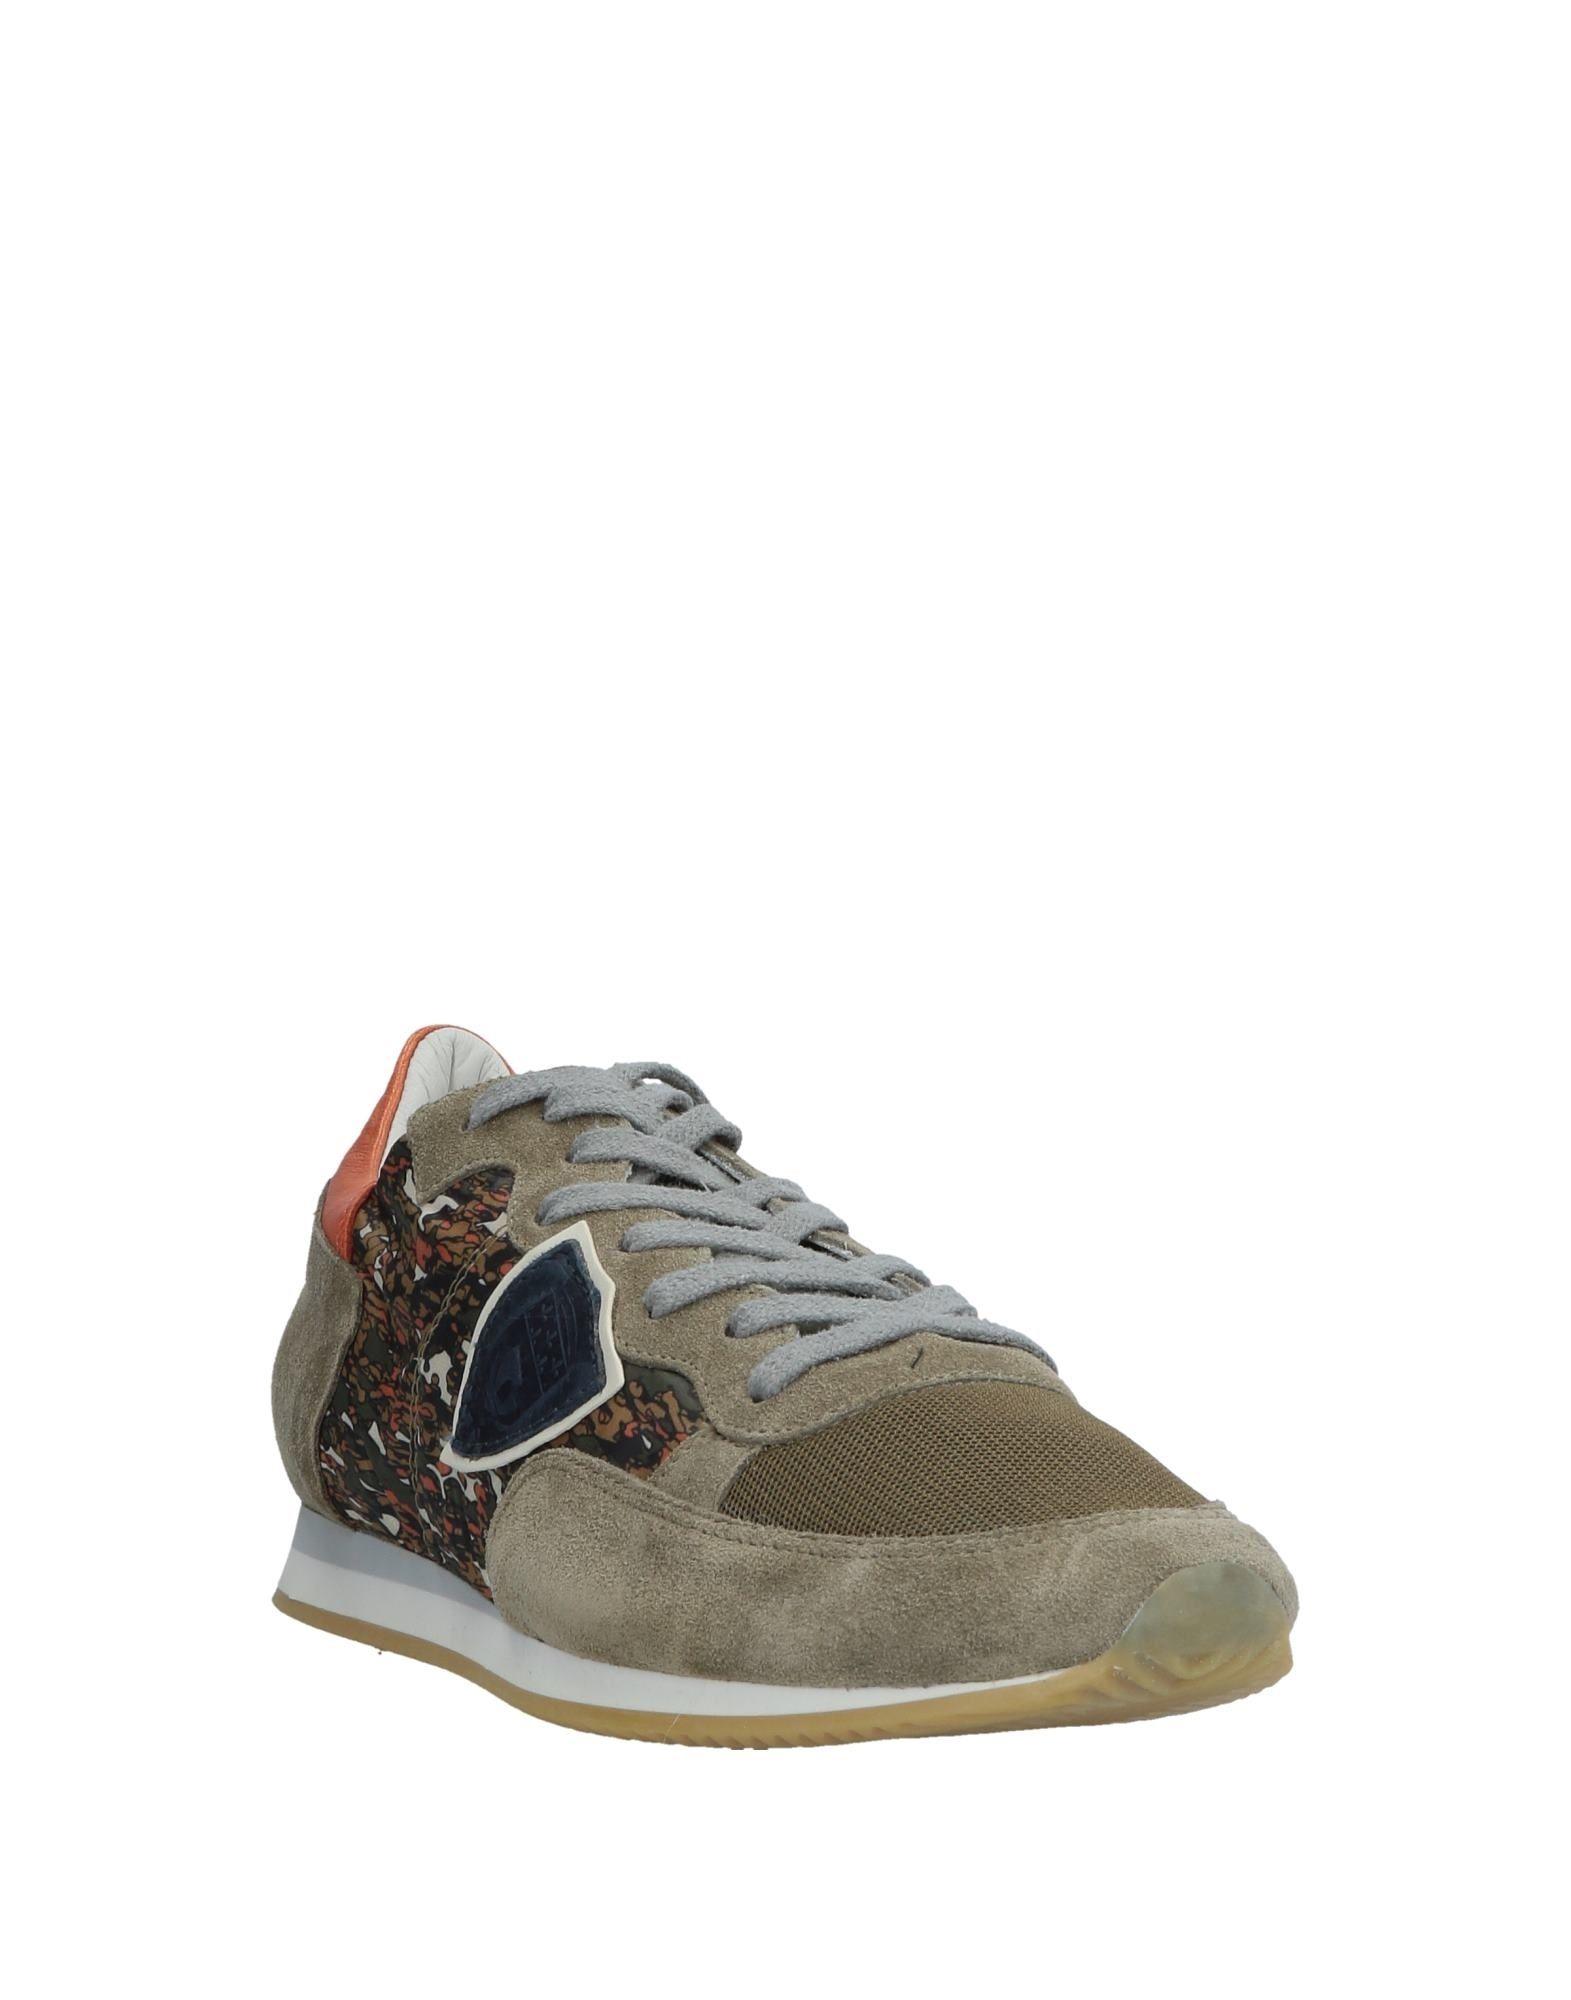 Philippe Model Model Model Sneakers - Men Philippe Model Sneakers online on  Australia - 11574634ES f3360e